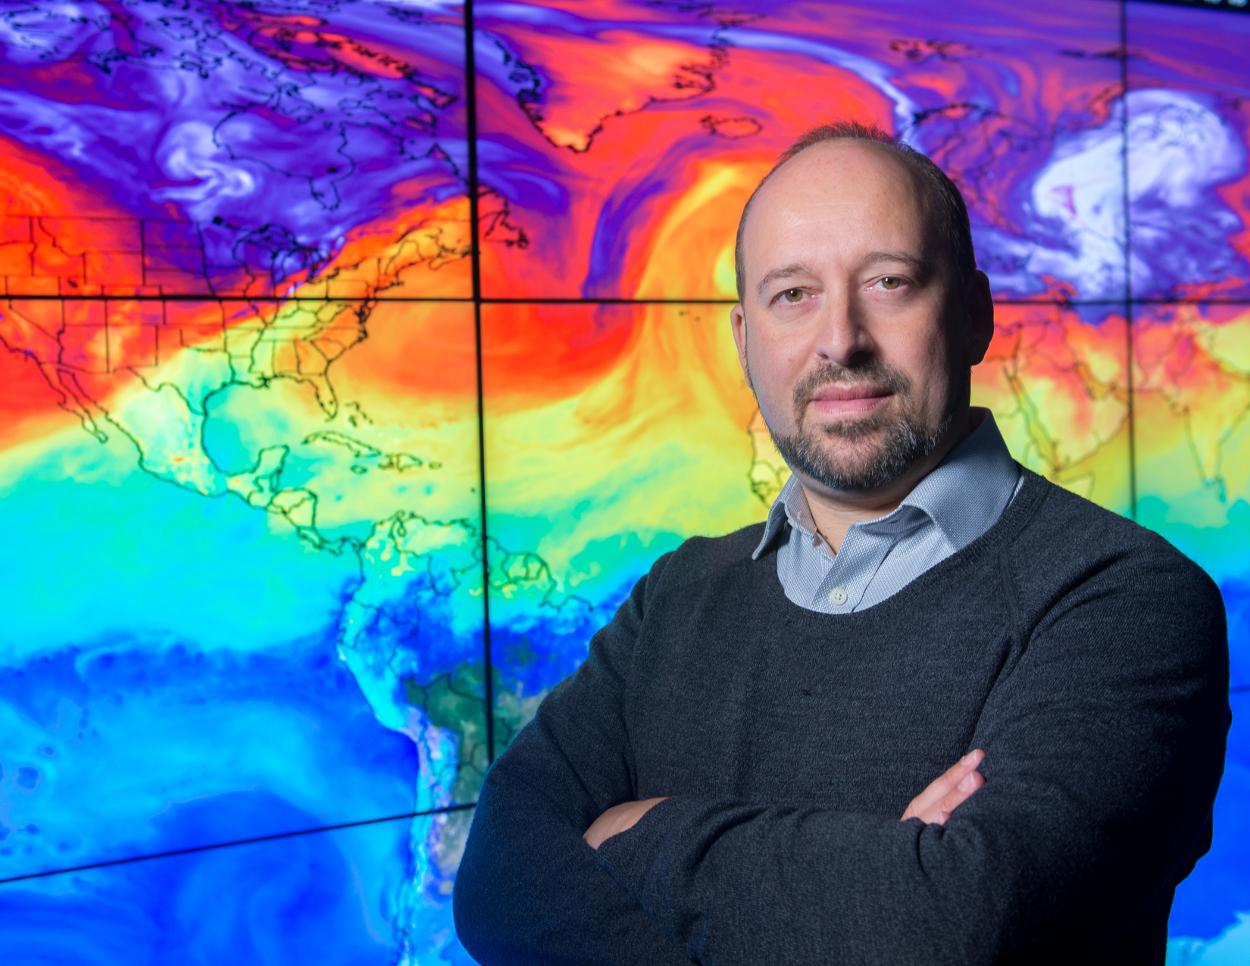 Photograph of Dr Gavin Schmidt